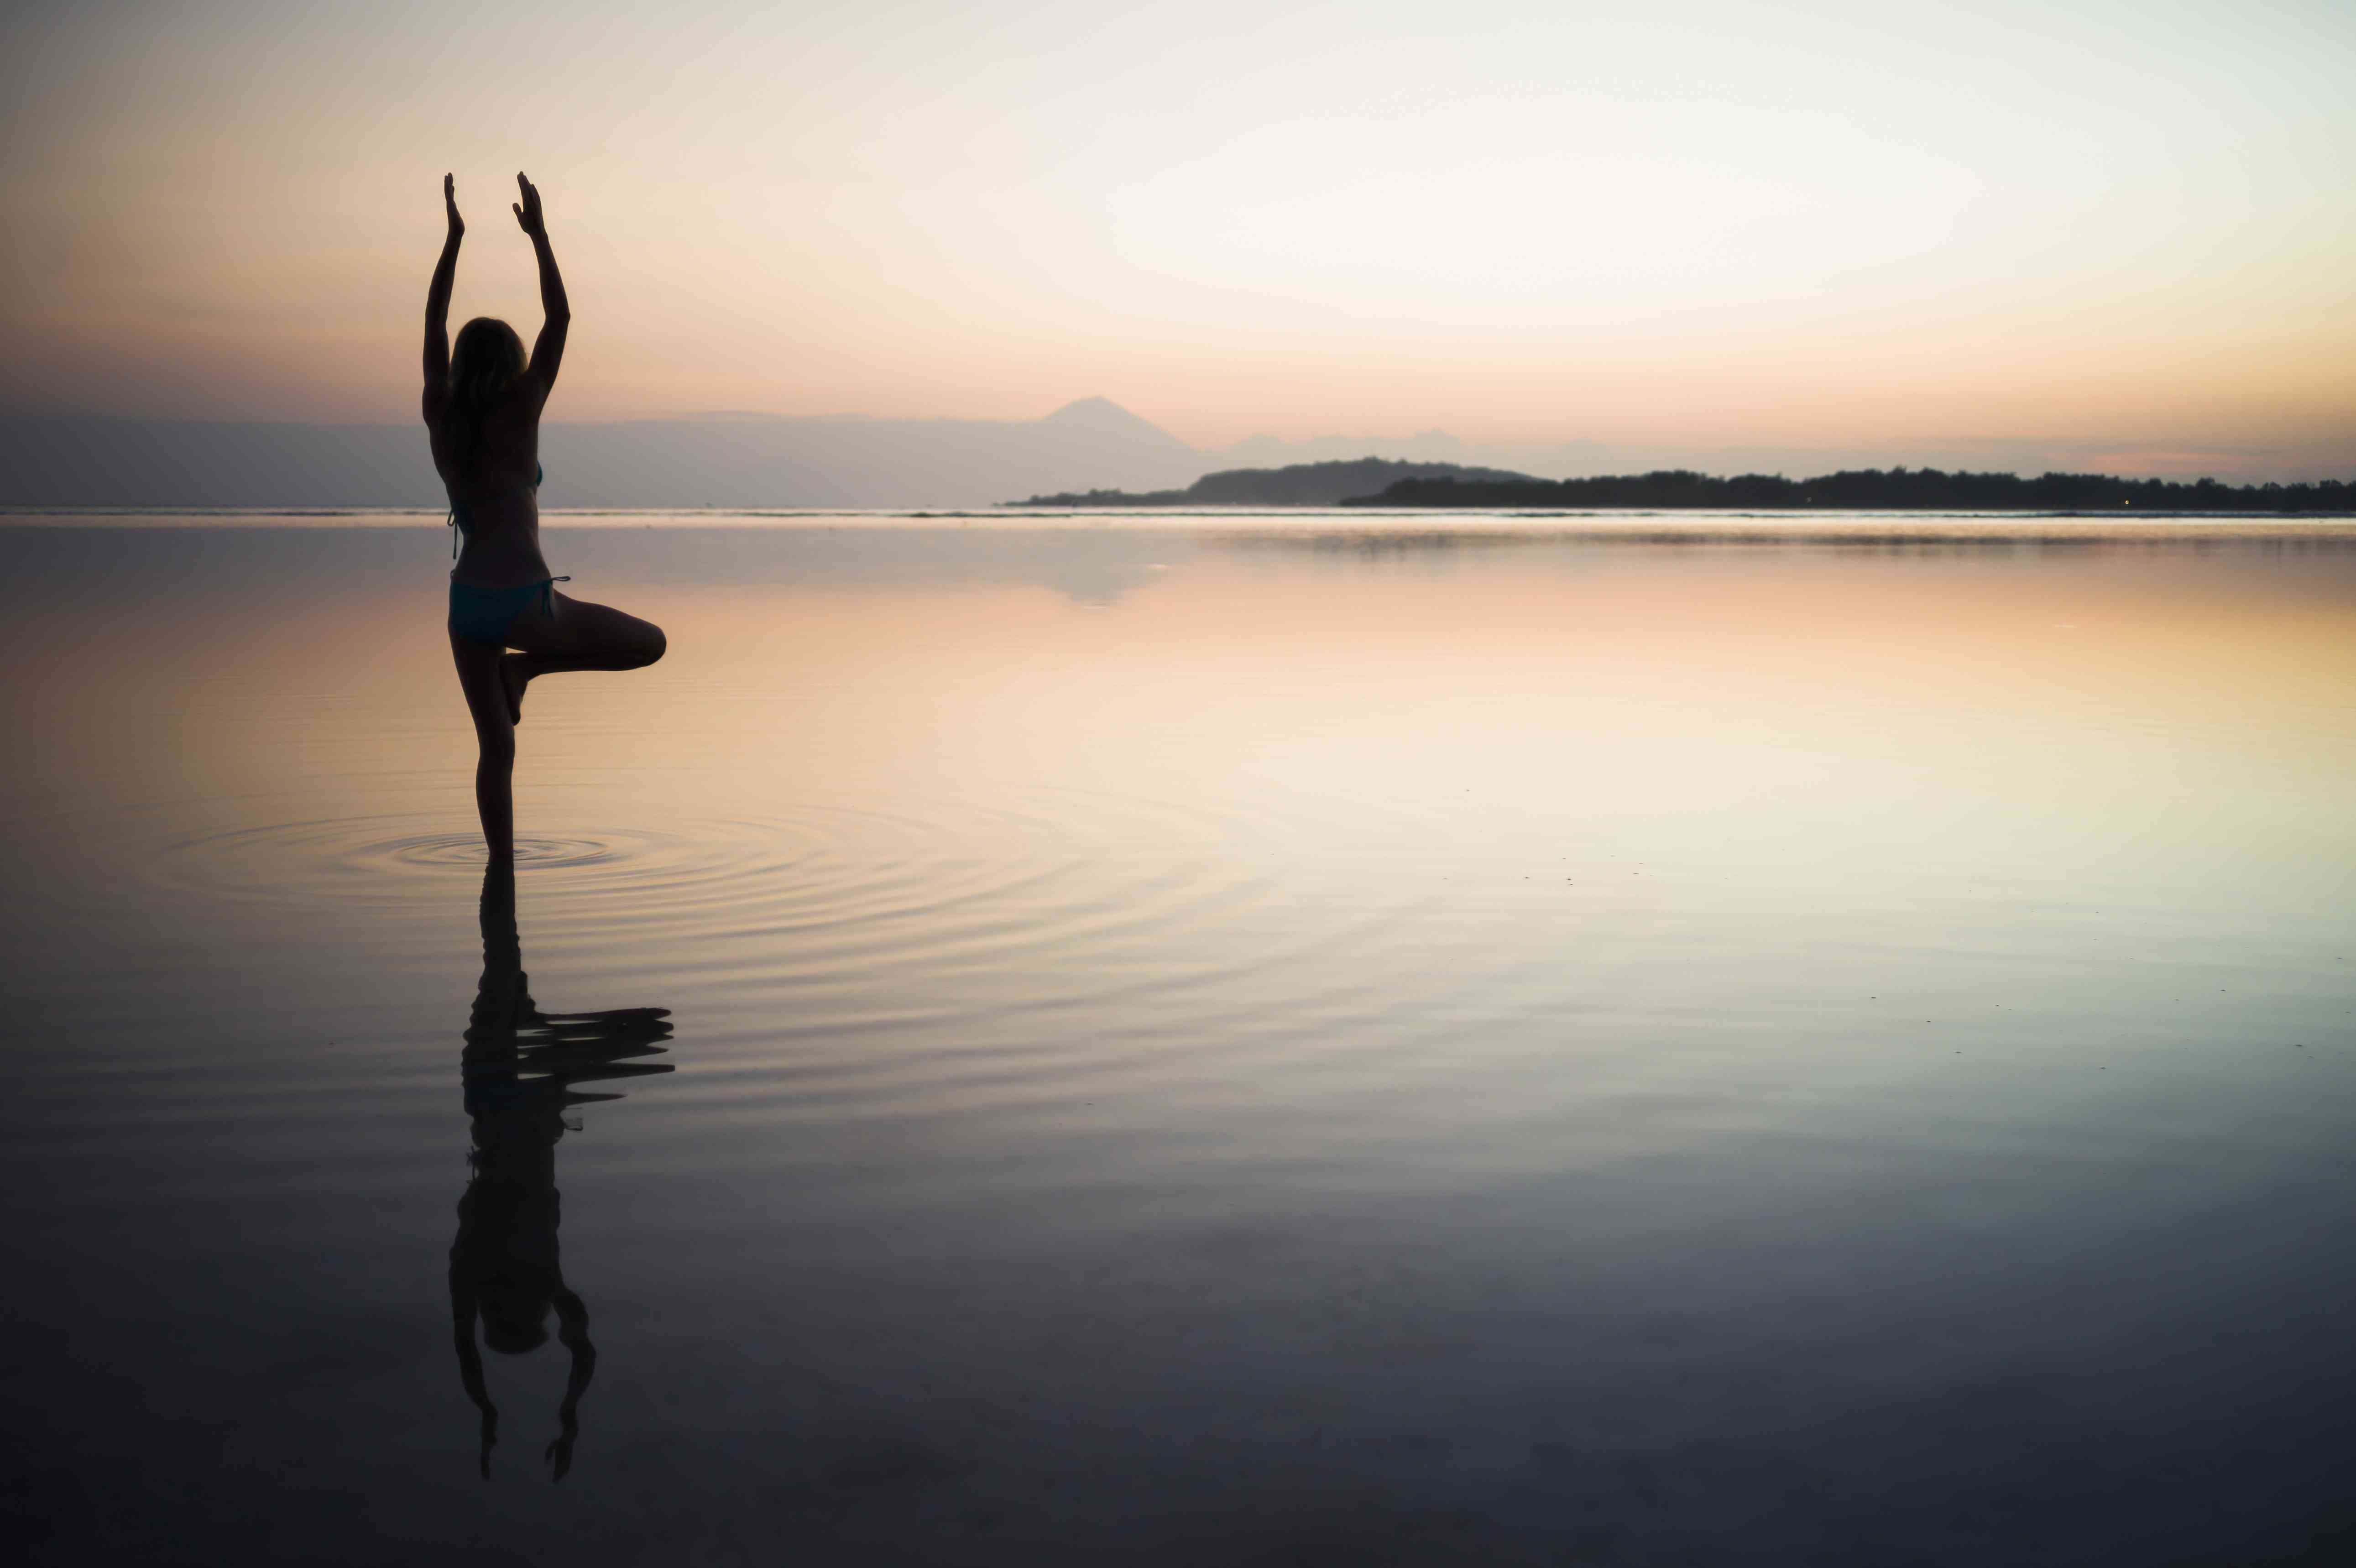 Woman doing yoga pose in water